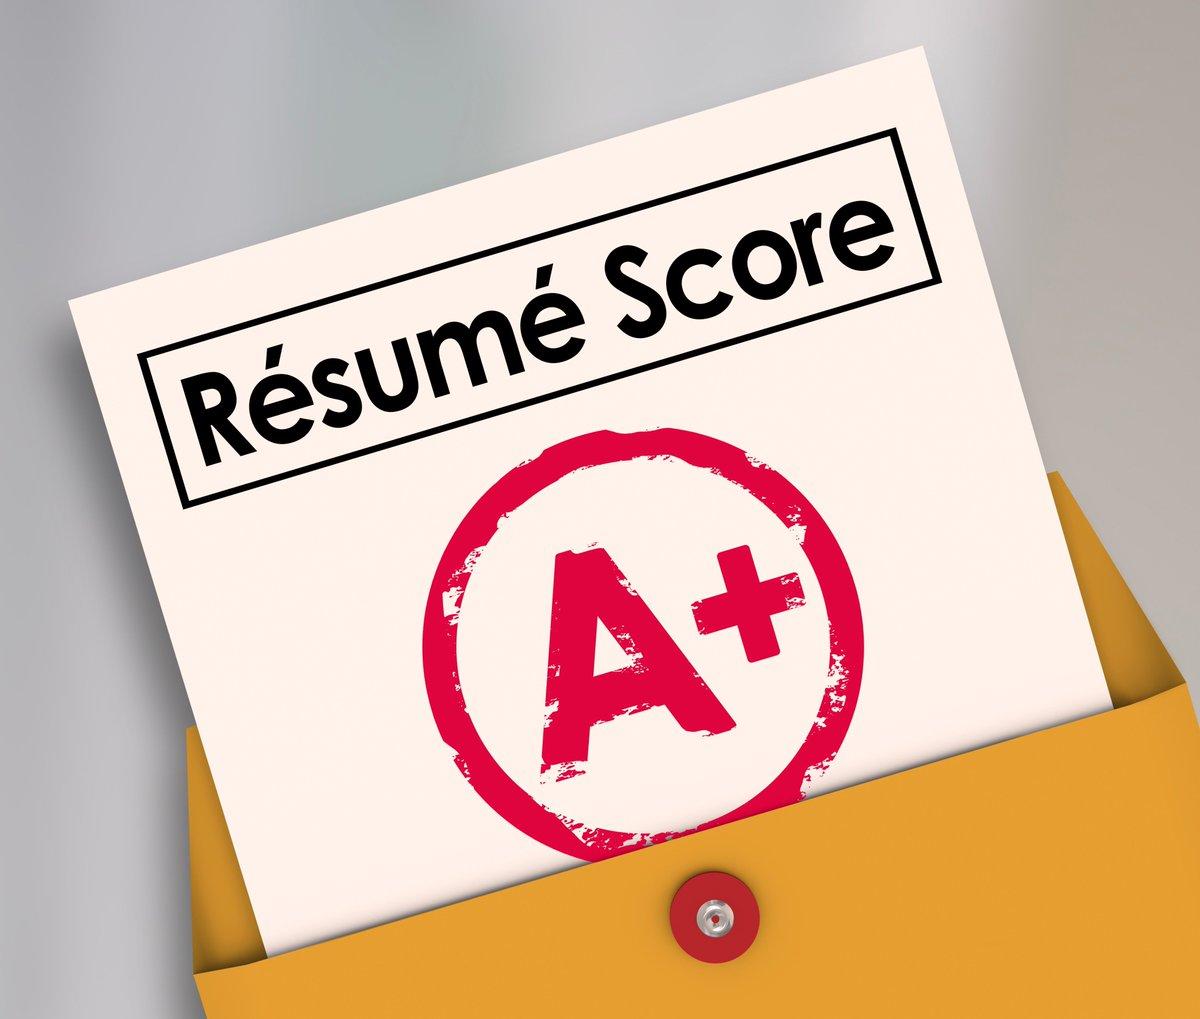 job interview tips interviewtips twitter 0 replies 3 retweets 3 likes